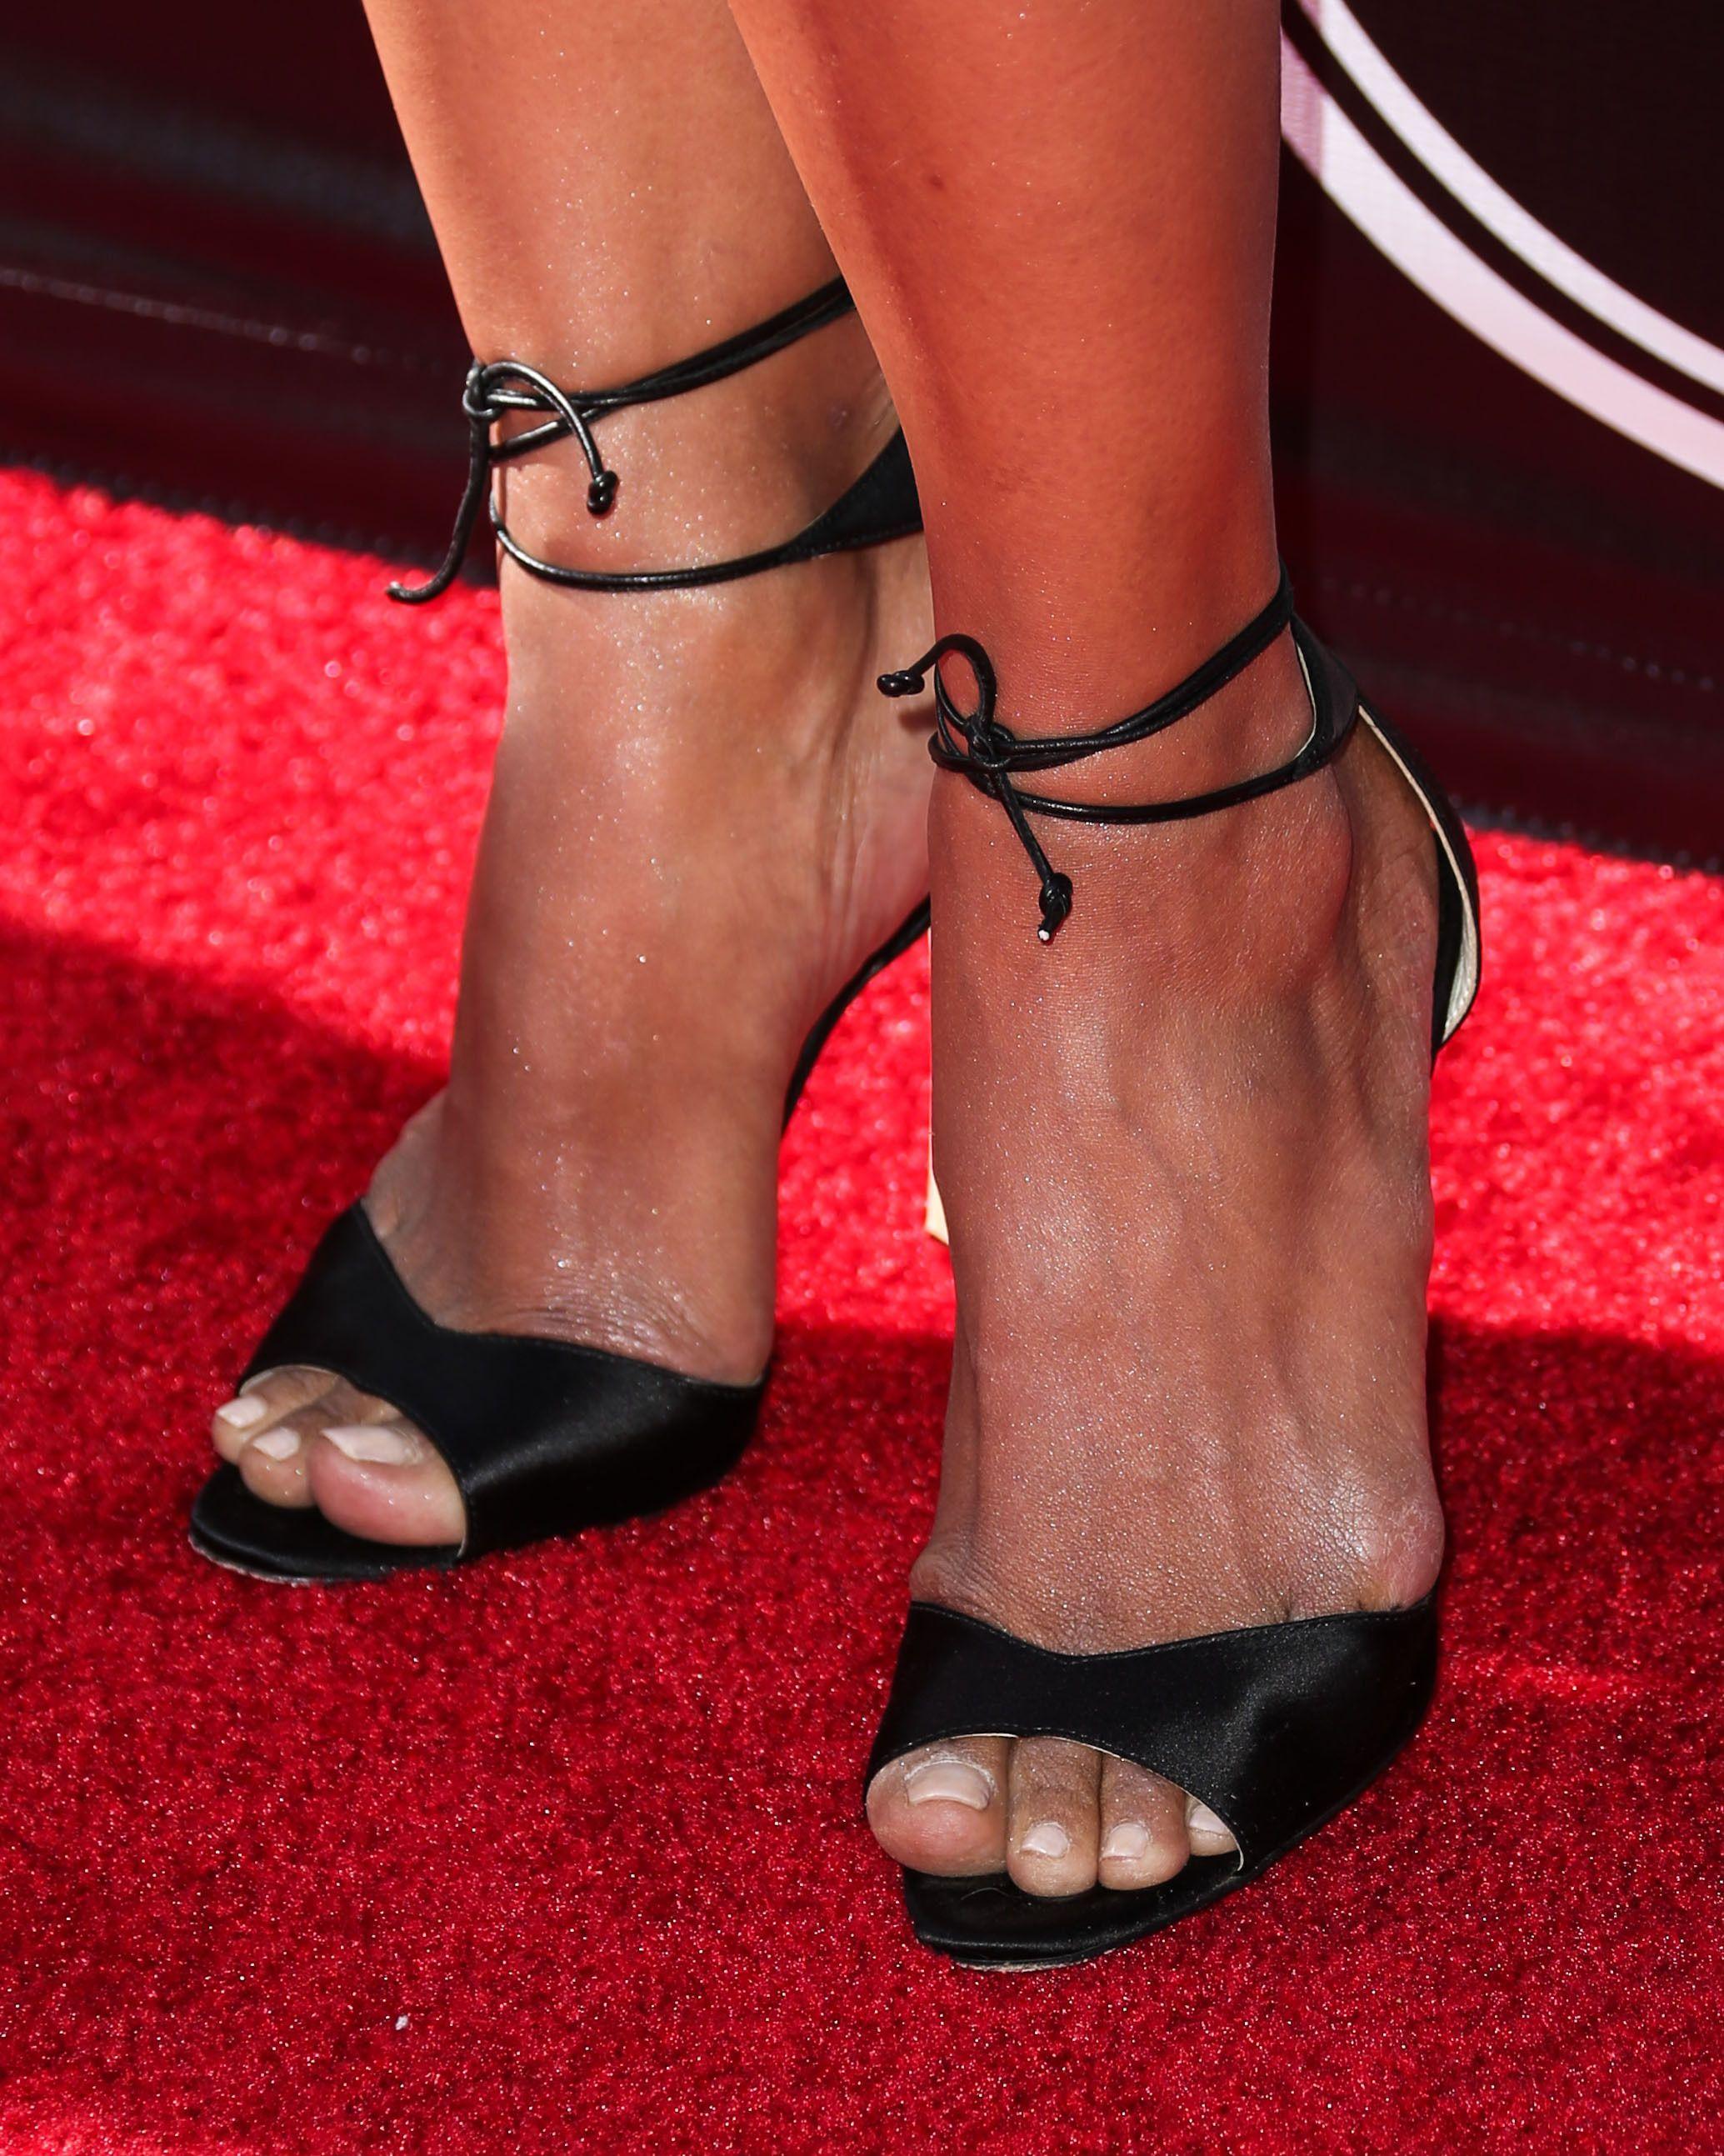 halle berry nude feet